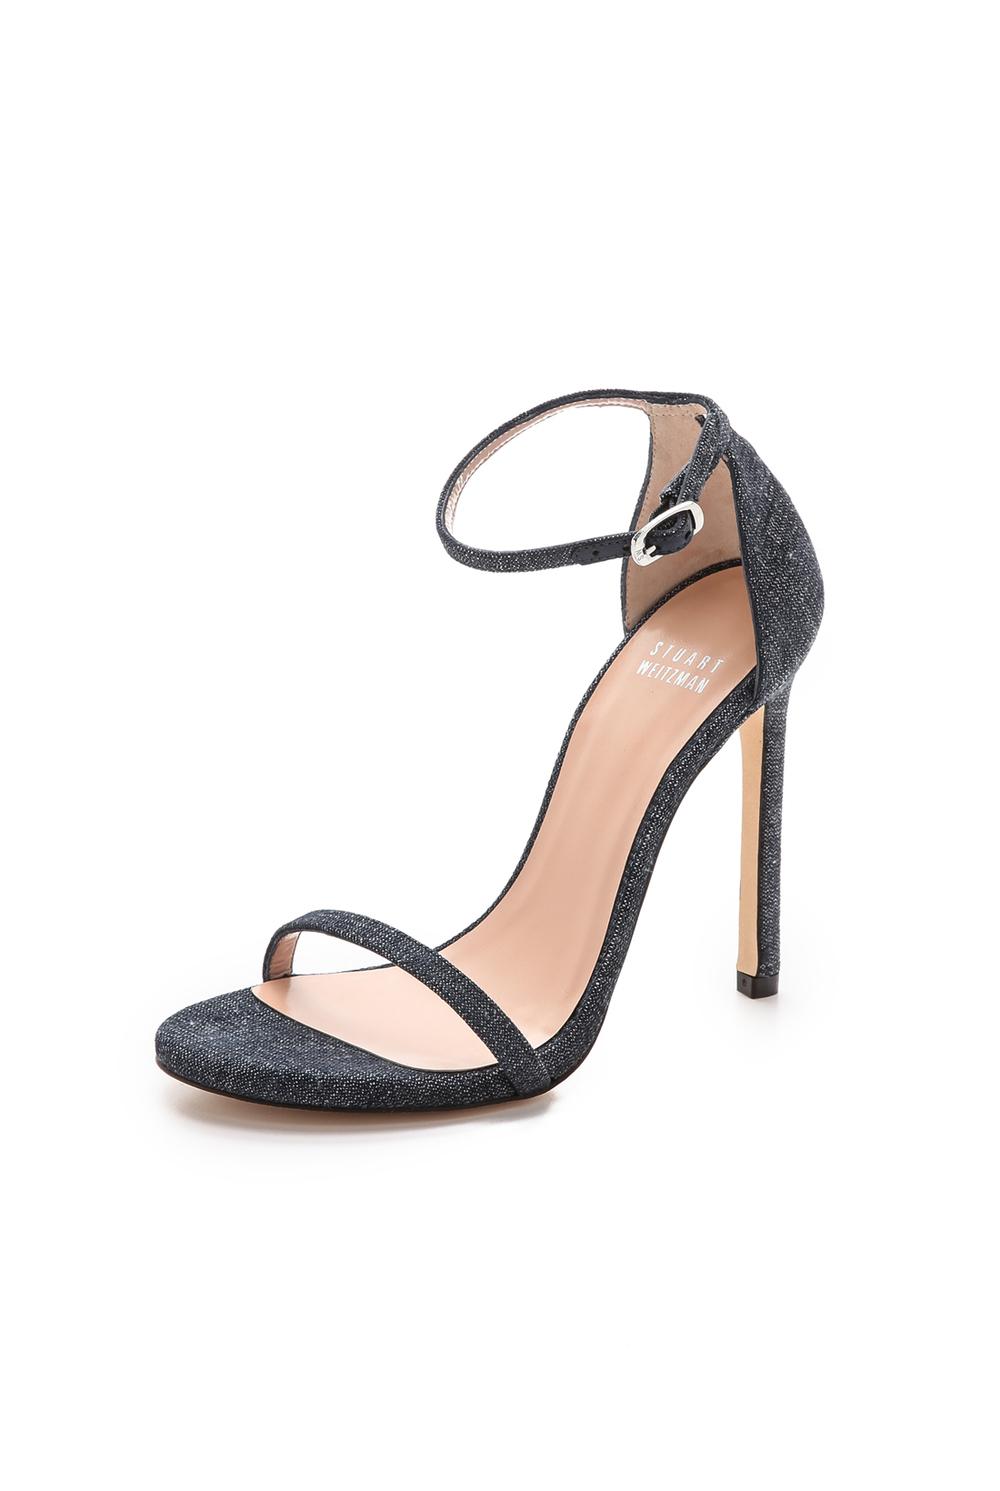 07-spring-denim-trends-shoes-04.jpg